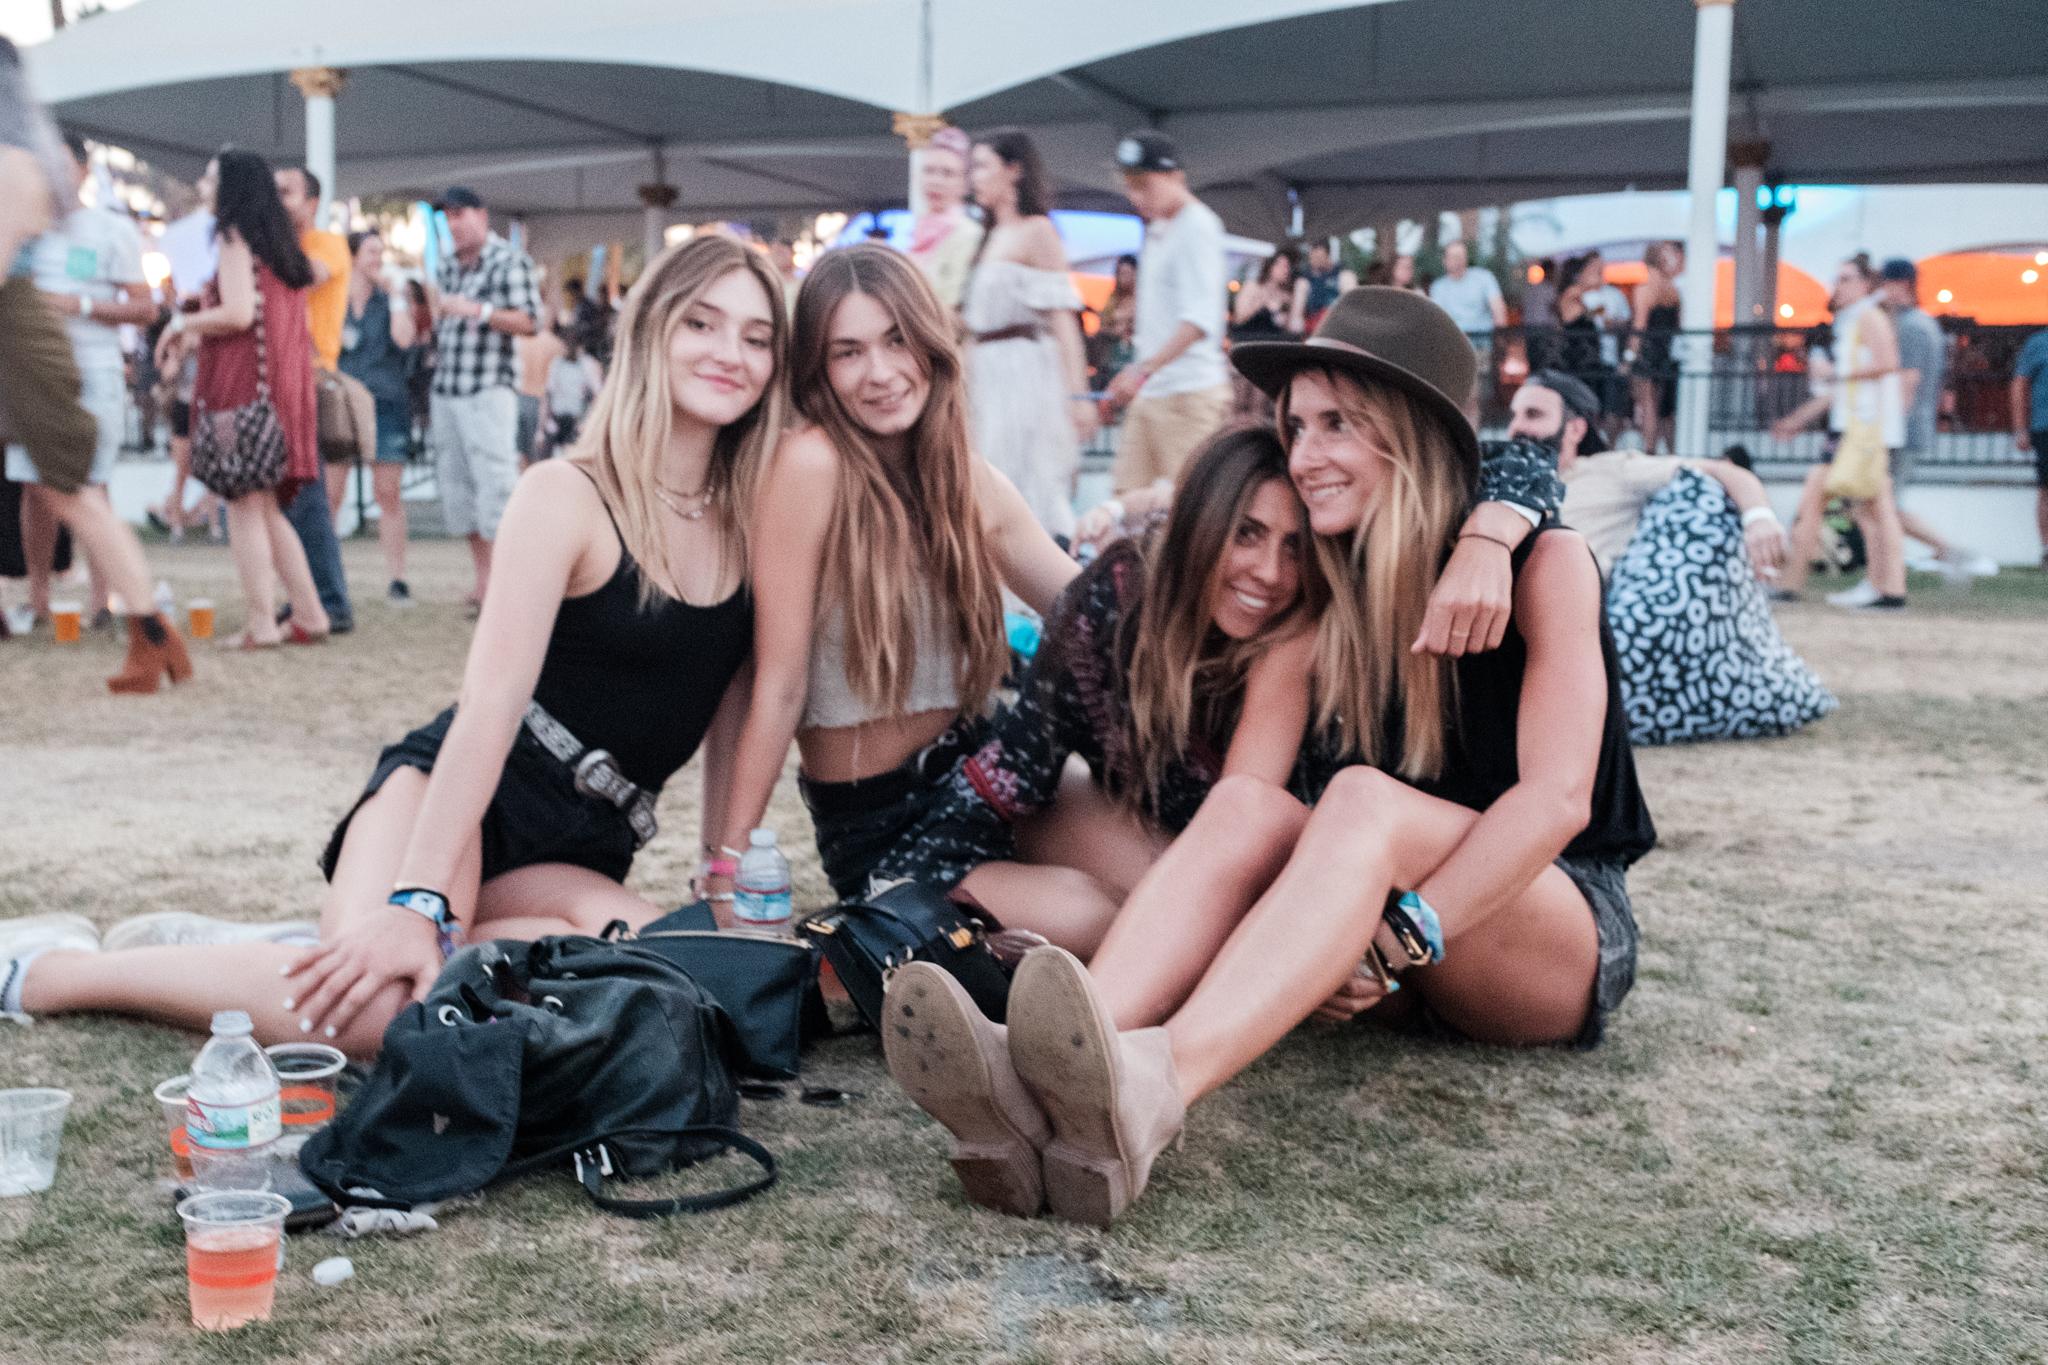 170423 Coachella 17 w2 2118.jpg